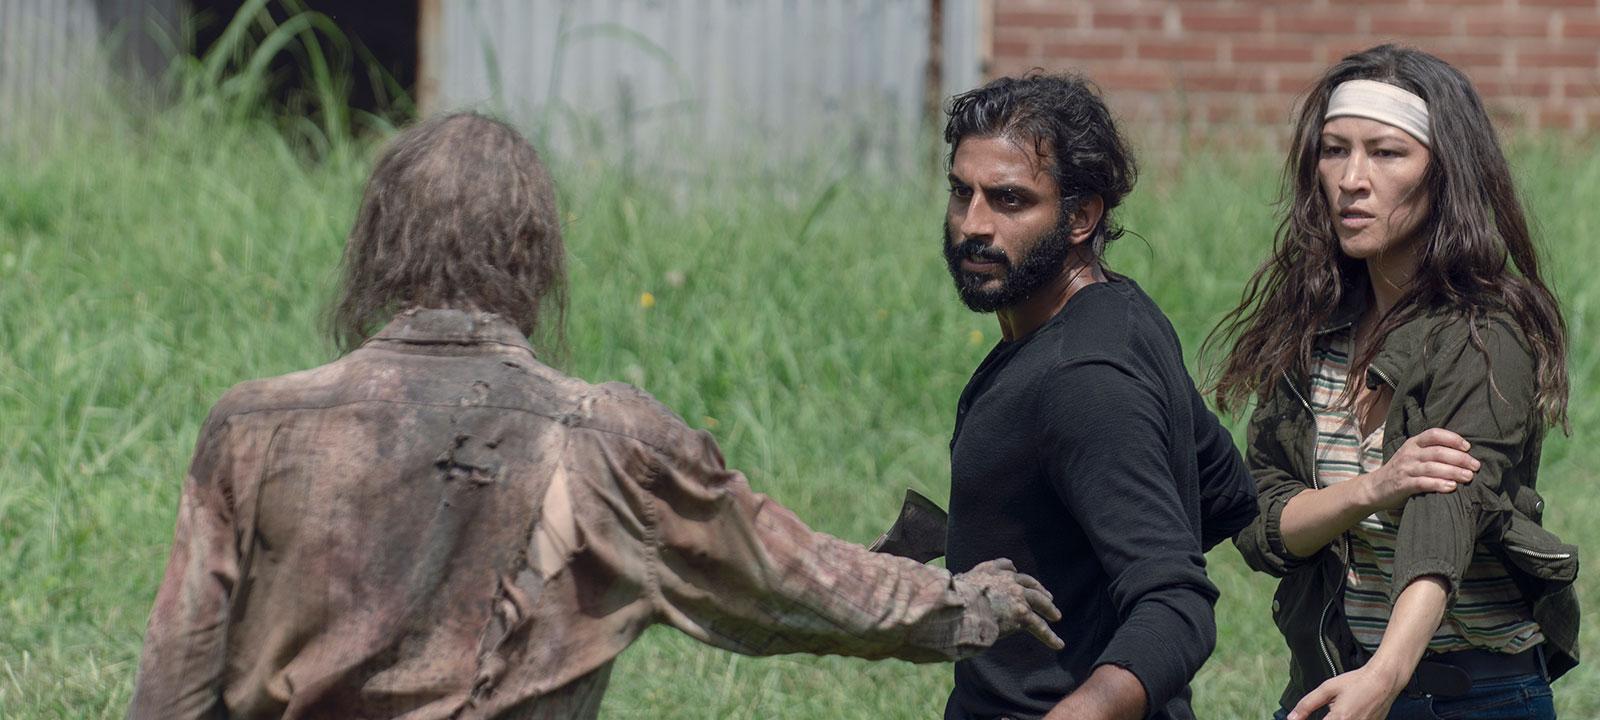 the-walking-dead-episode-907-siddiq-nash-800×600-interview